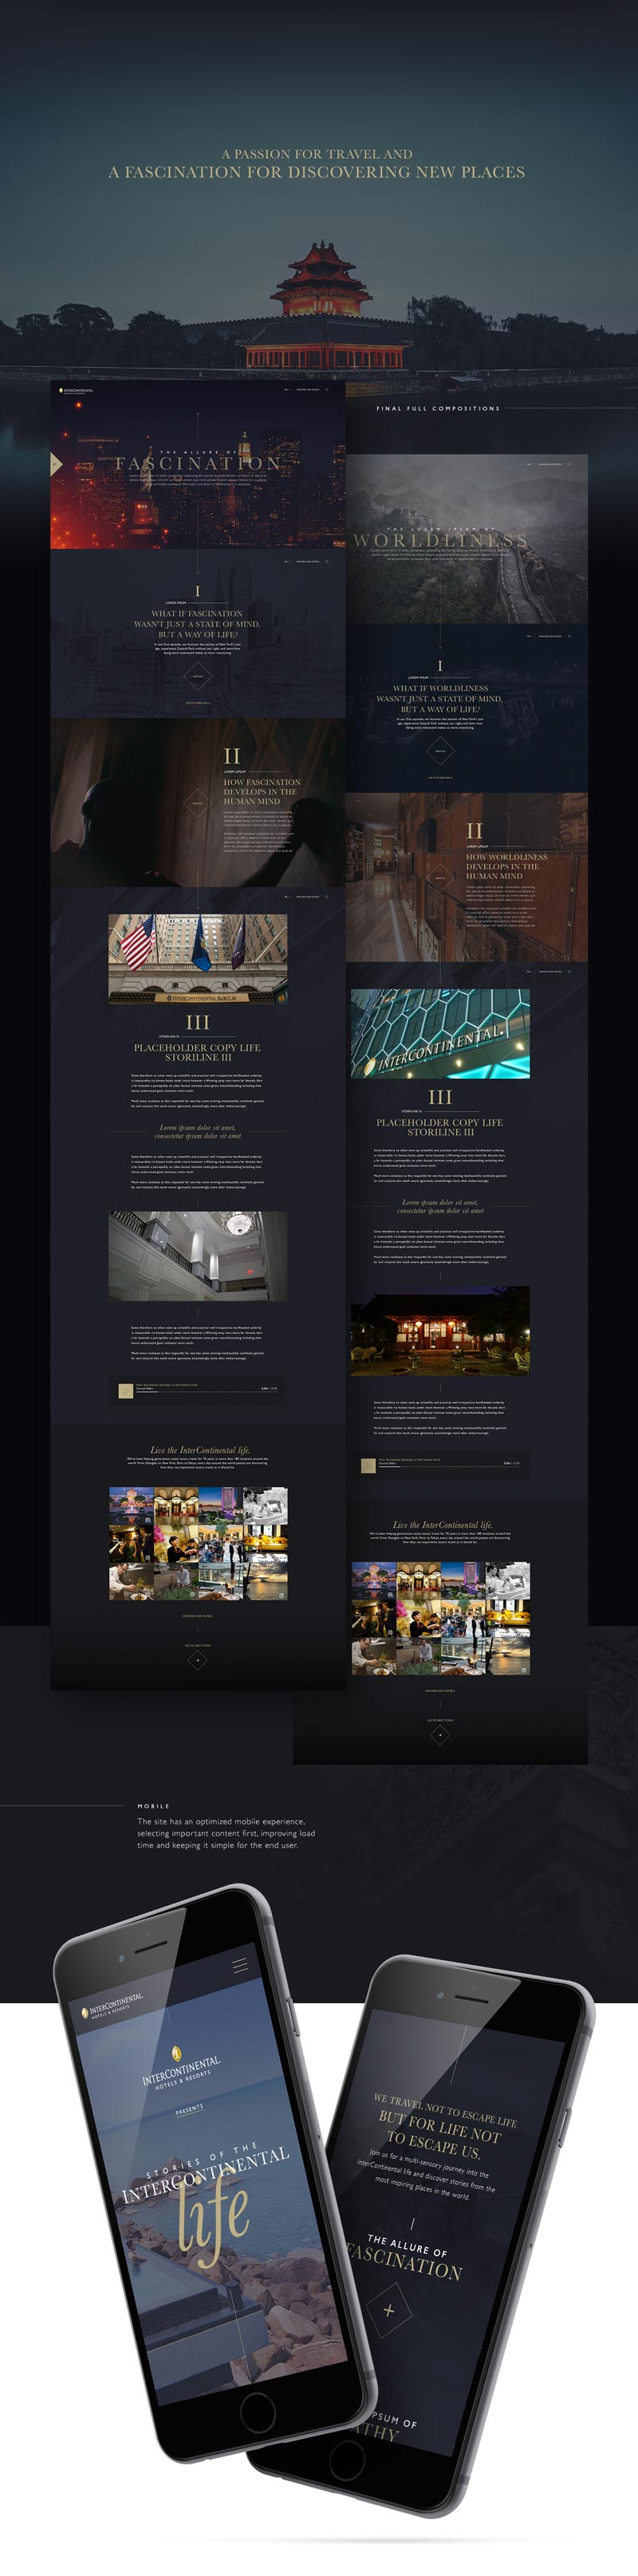 Intercontinental hotel website behance ui ux userexperience